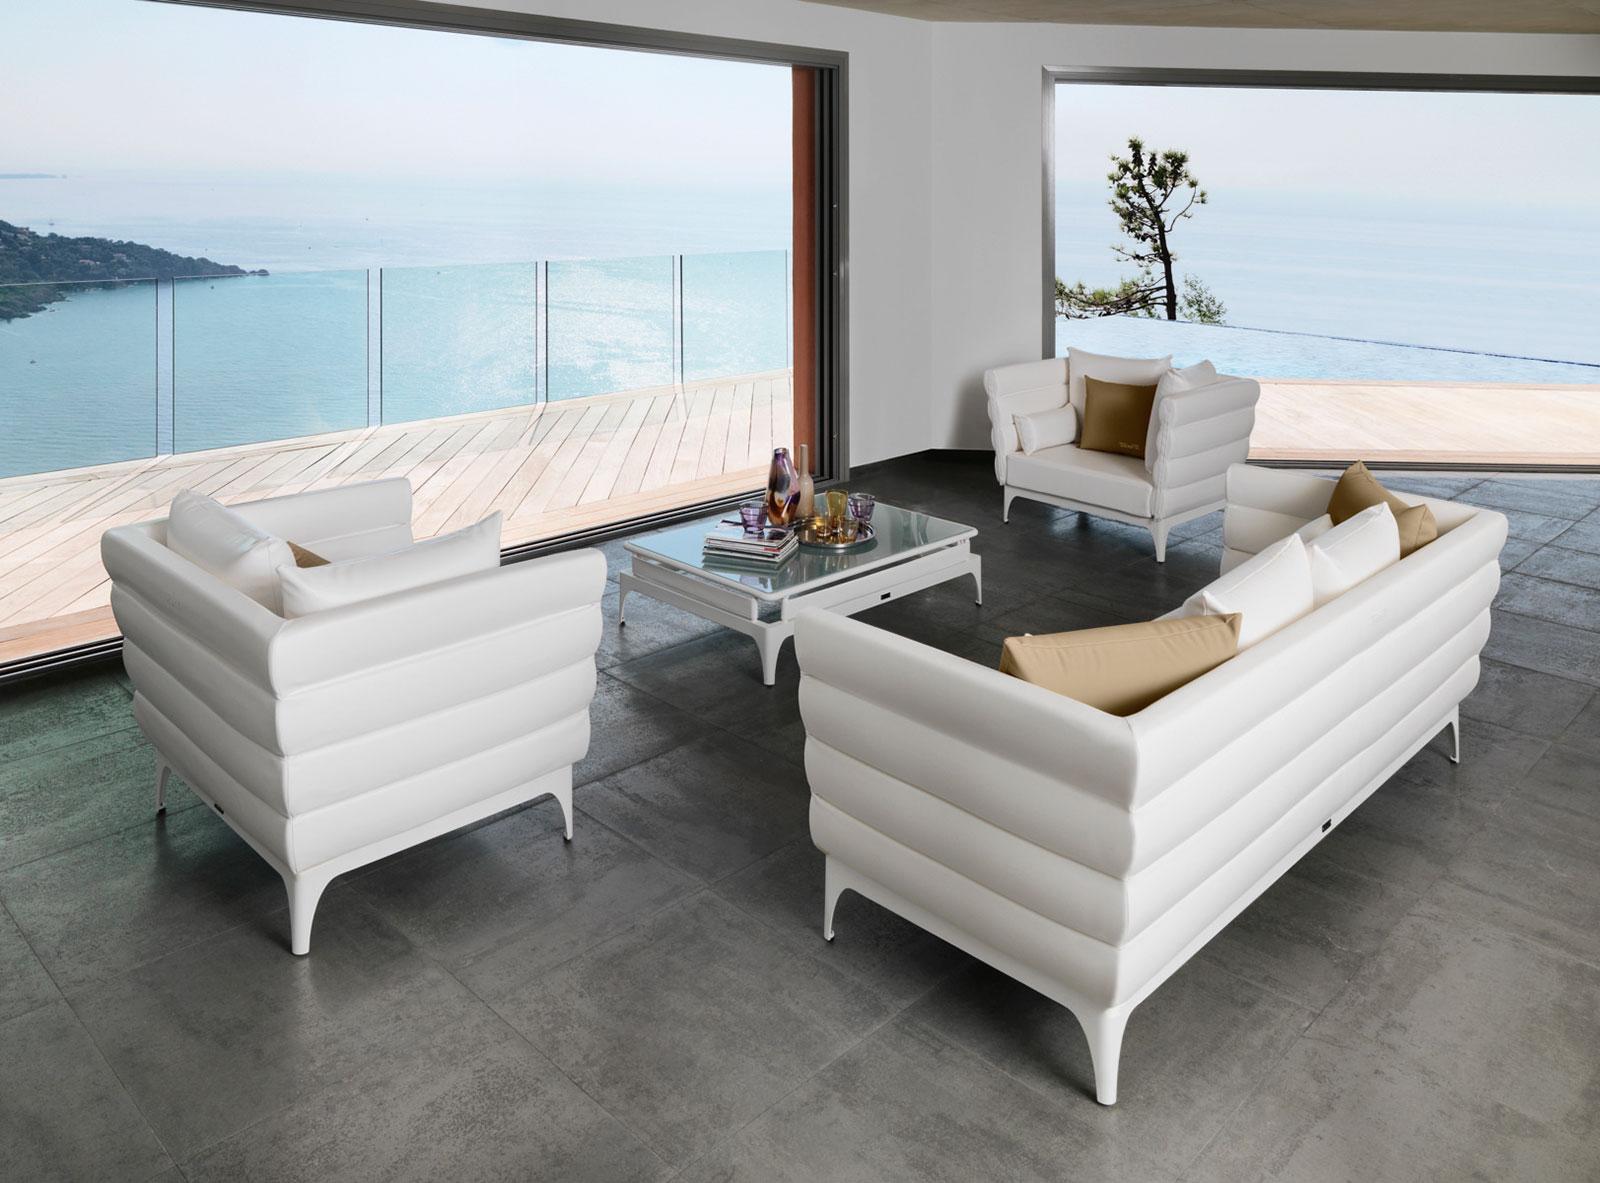 Salon de Jardin | Vente en Ligne - Italy Dream Design